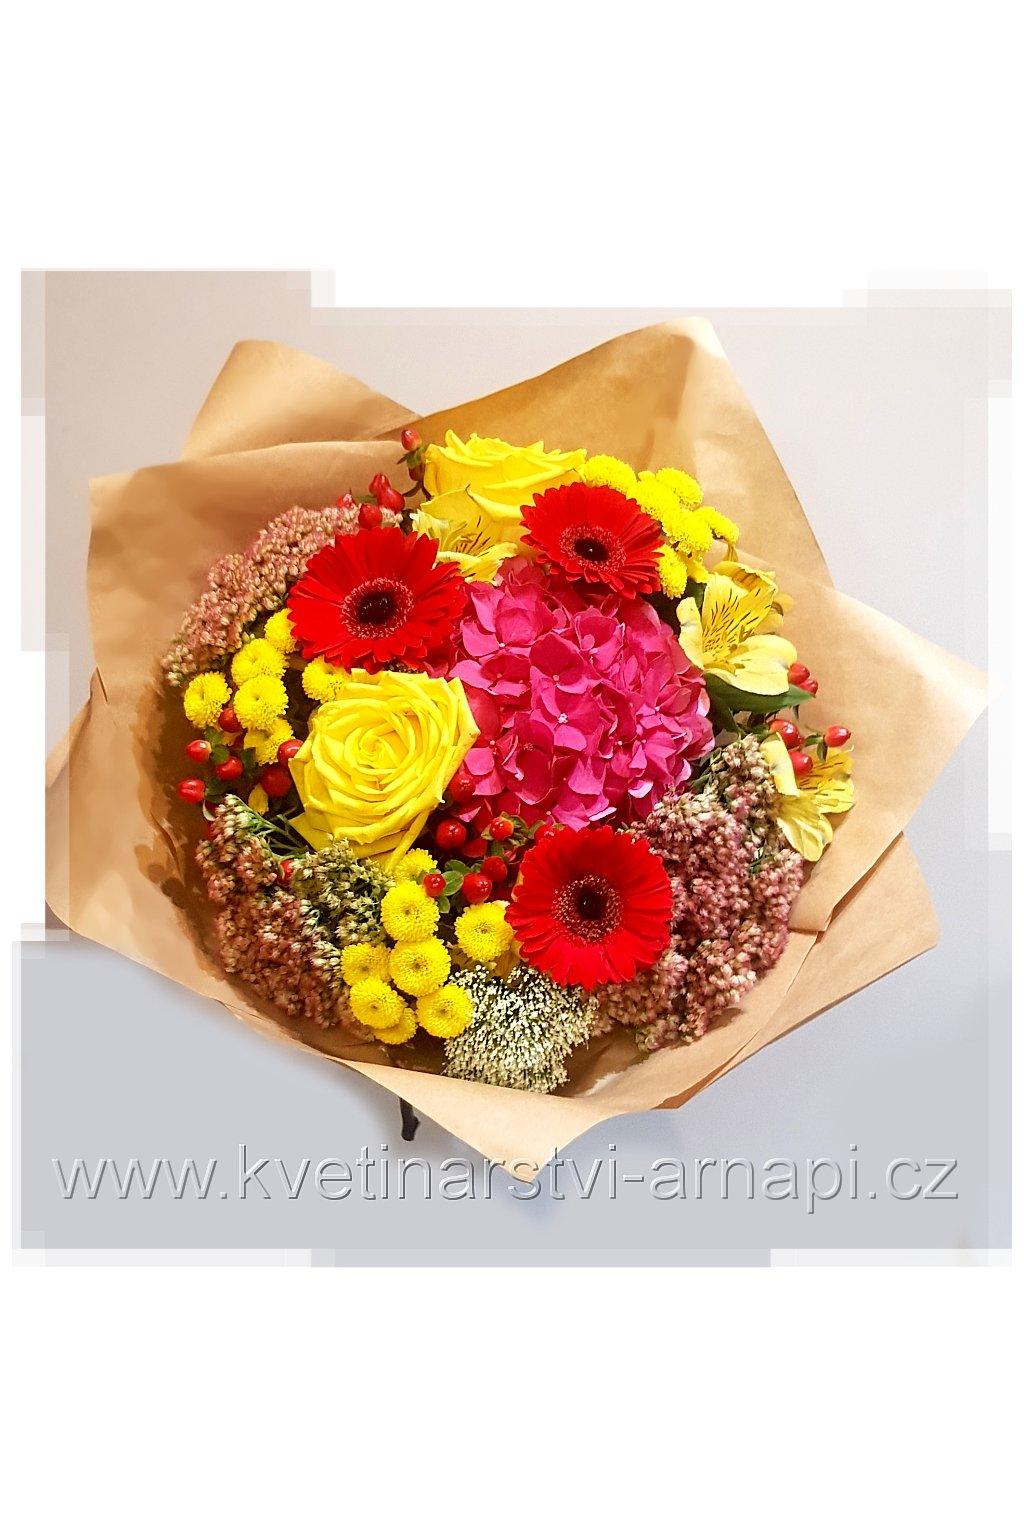 darkova kytice kvetinarstvi arnapi rozvoz eshop gerbera 2